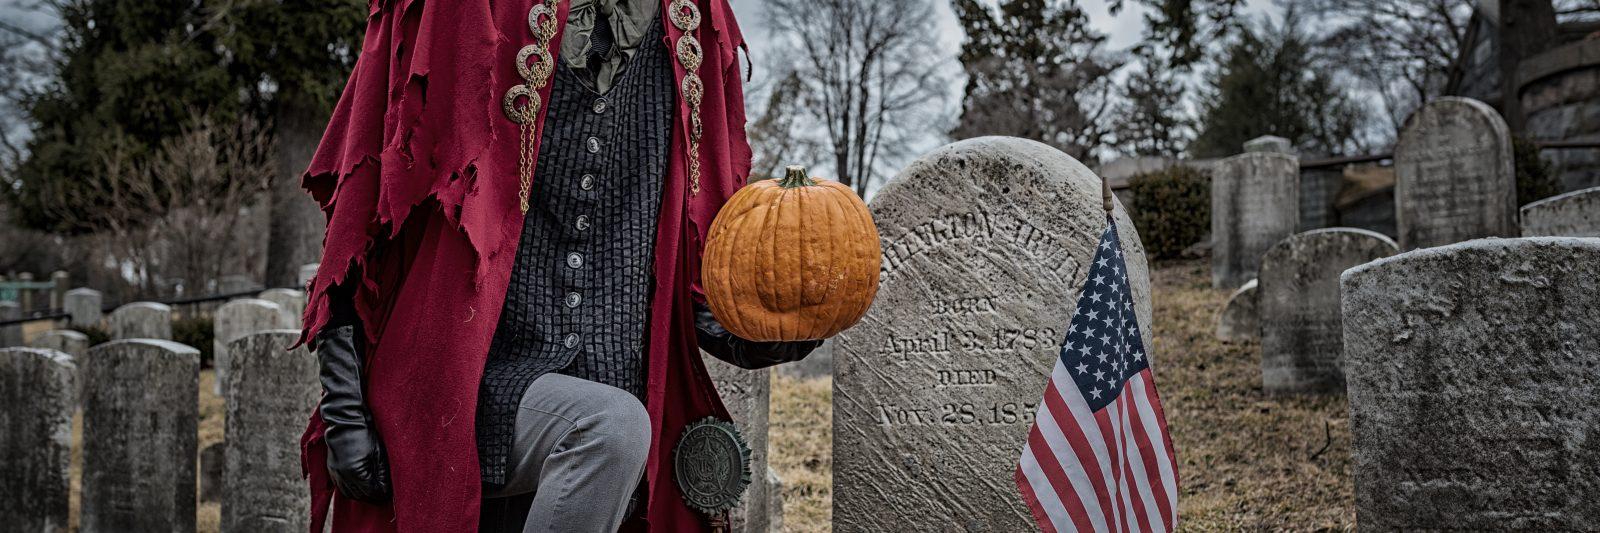 Headless Horseman kneeling at grave of Washington Irving